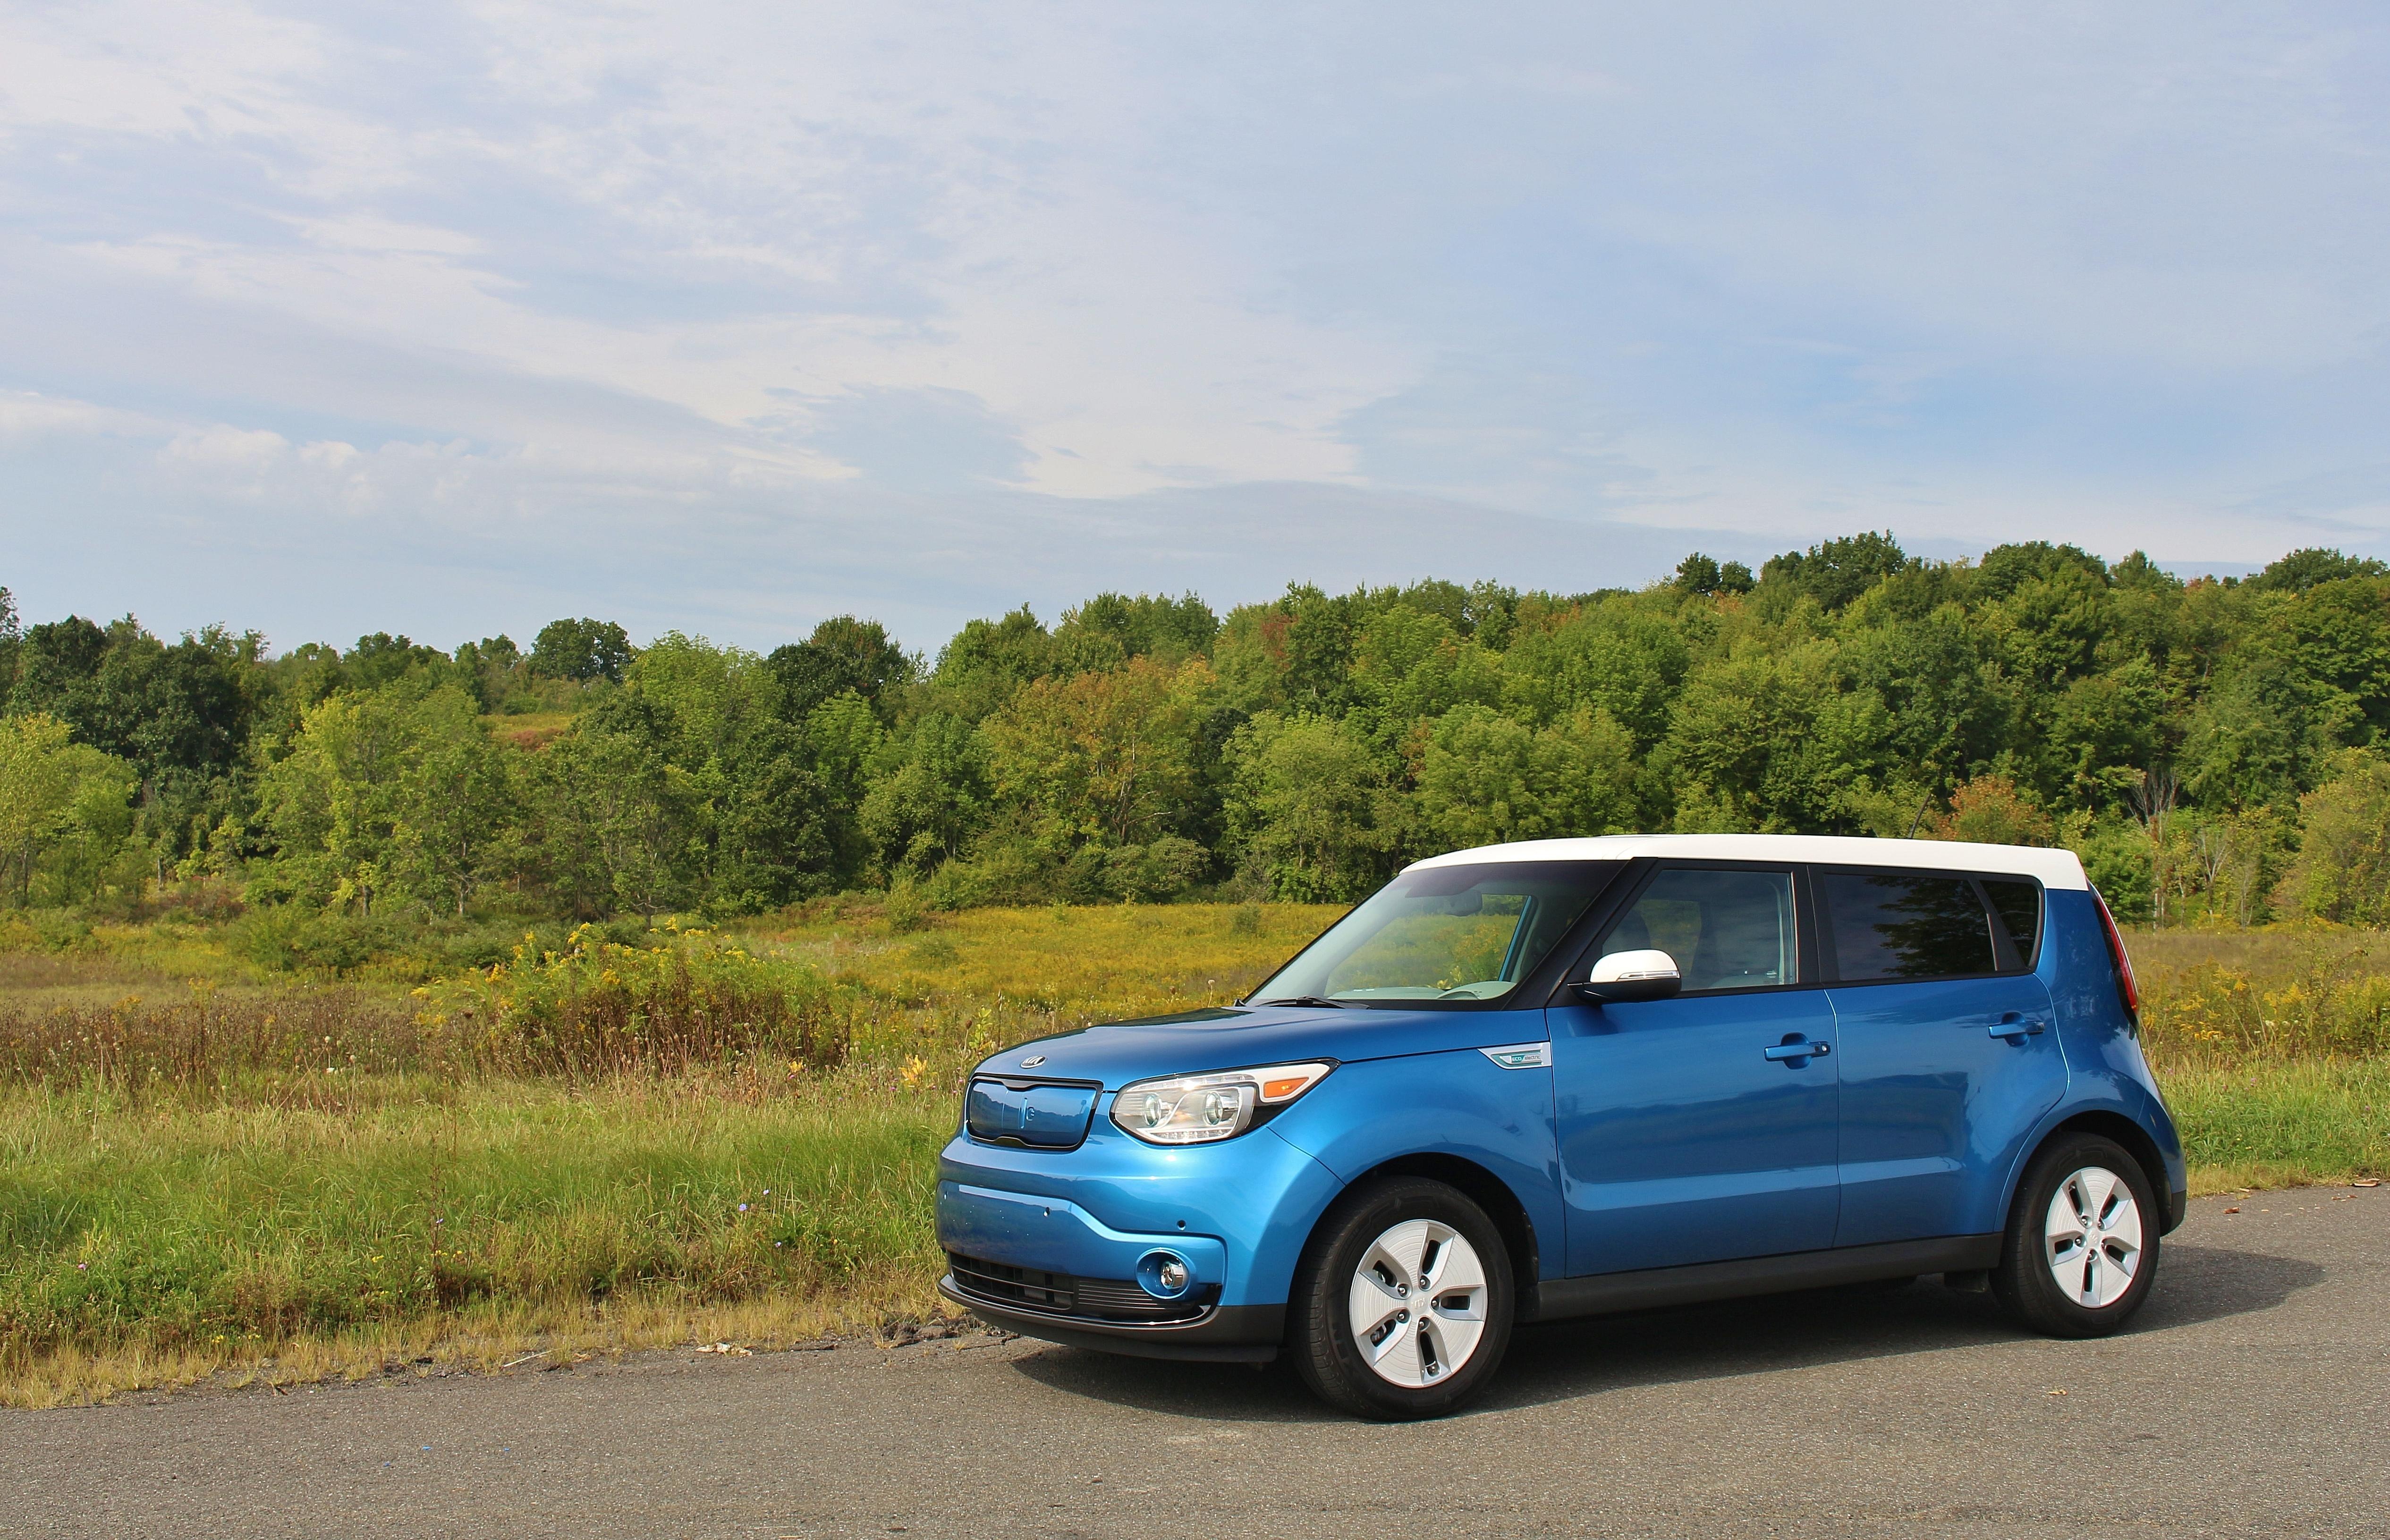 of soul salvage auto in sale left oh copart carfinder on blue cert online title kia auctions lot en view dayton